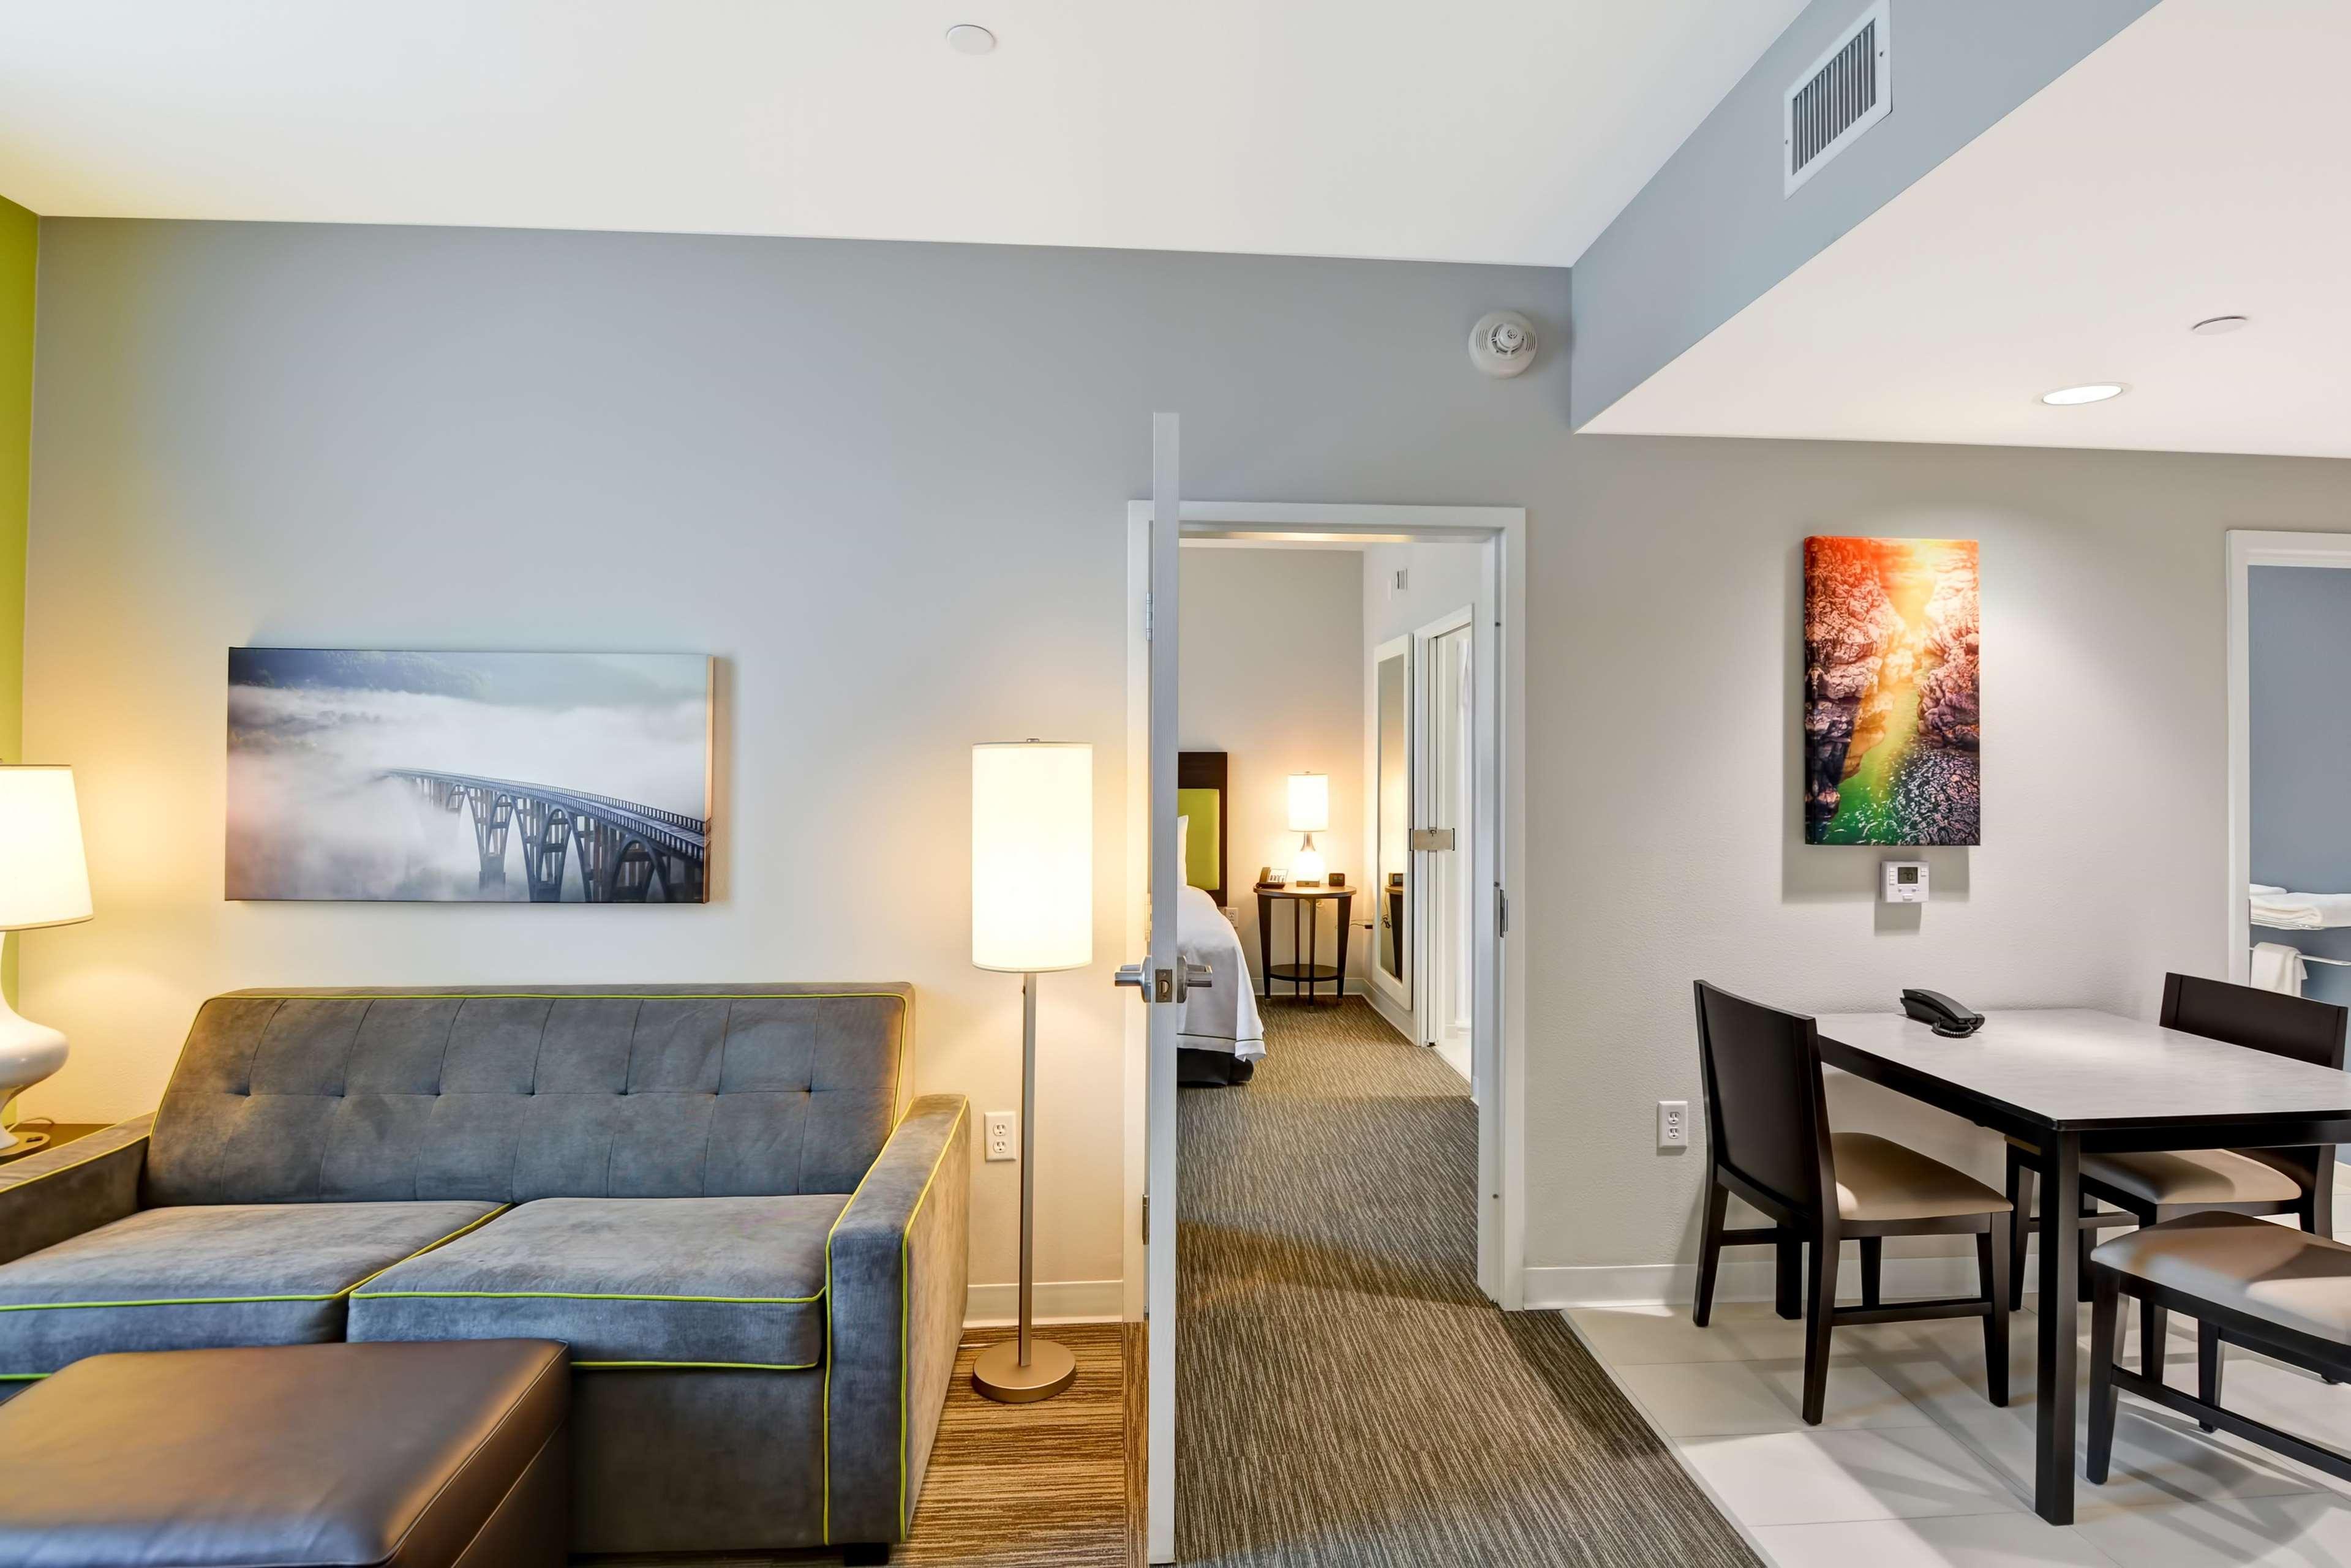 Home2 Suites by Hilton Azusa image 1